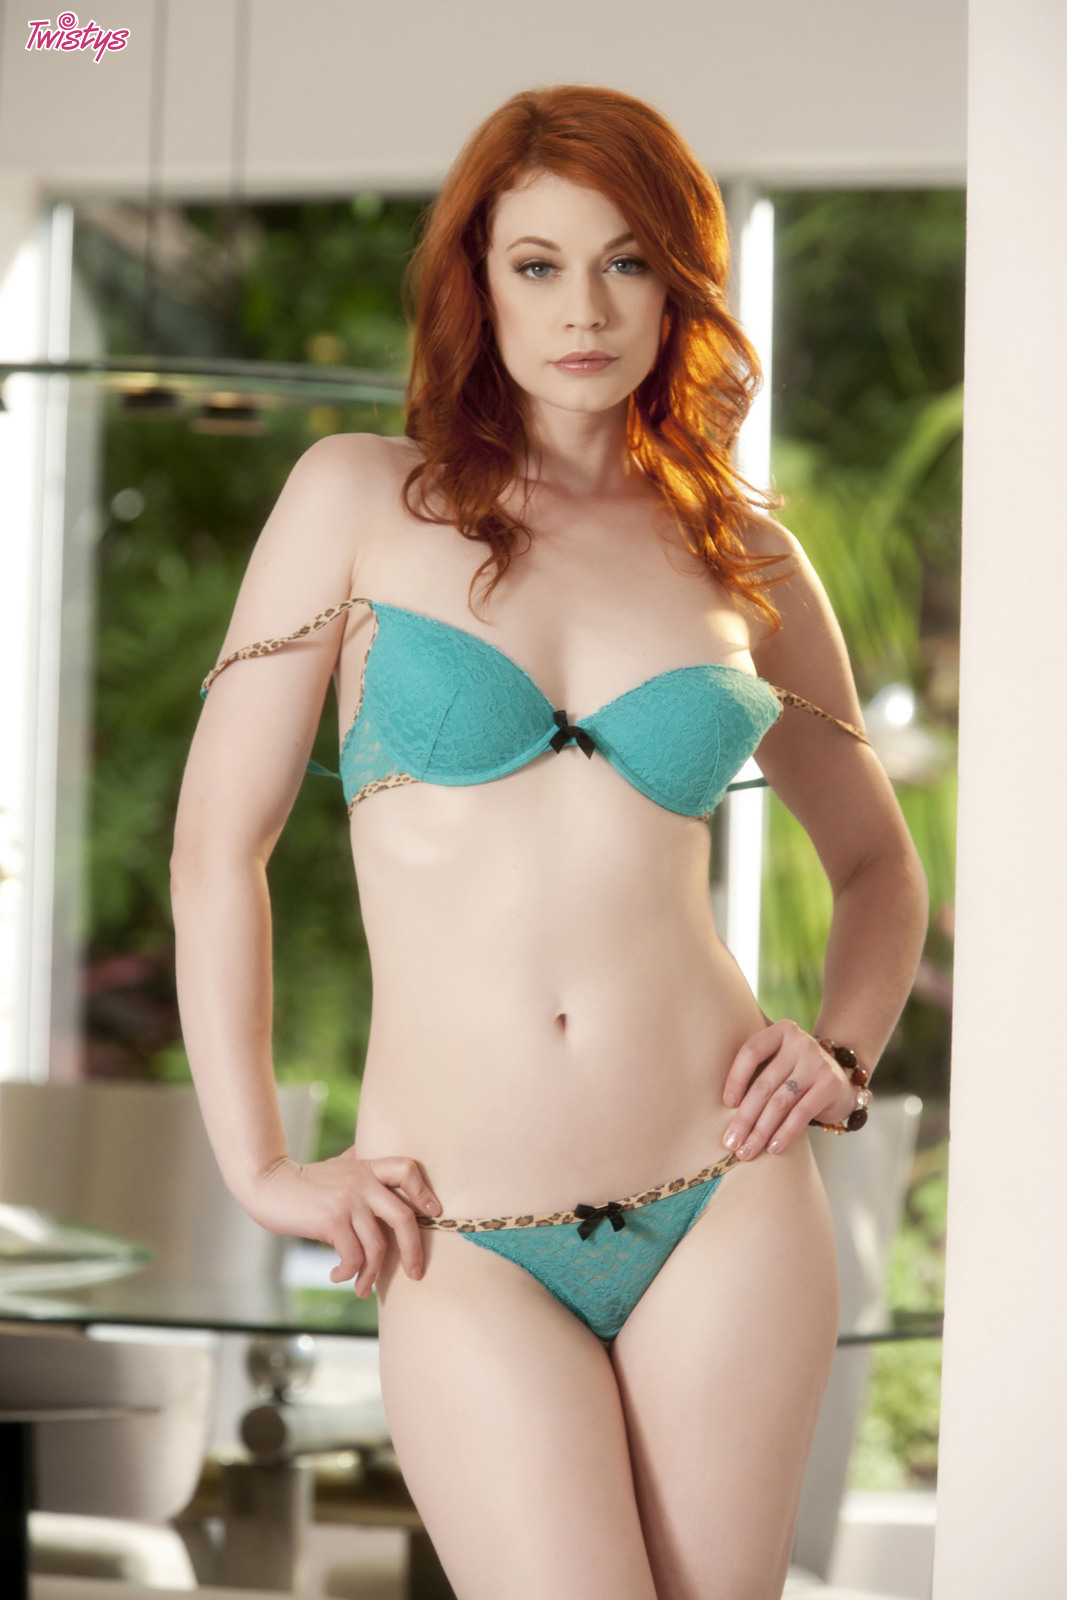 4206973_138627759492_baldcunt_erotiqlinks_greatass_JustineJoli_redhead_sexy.jpg